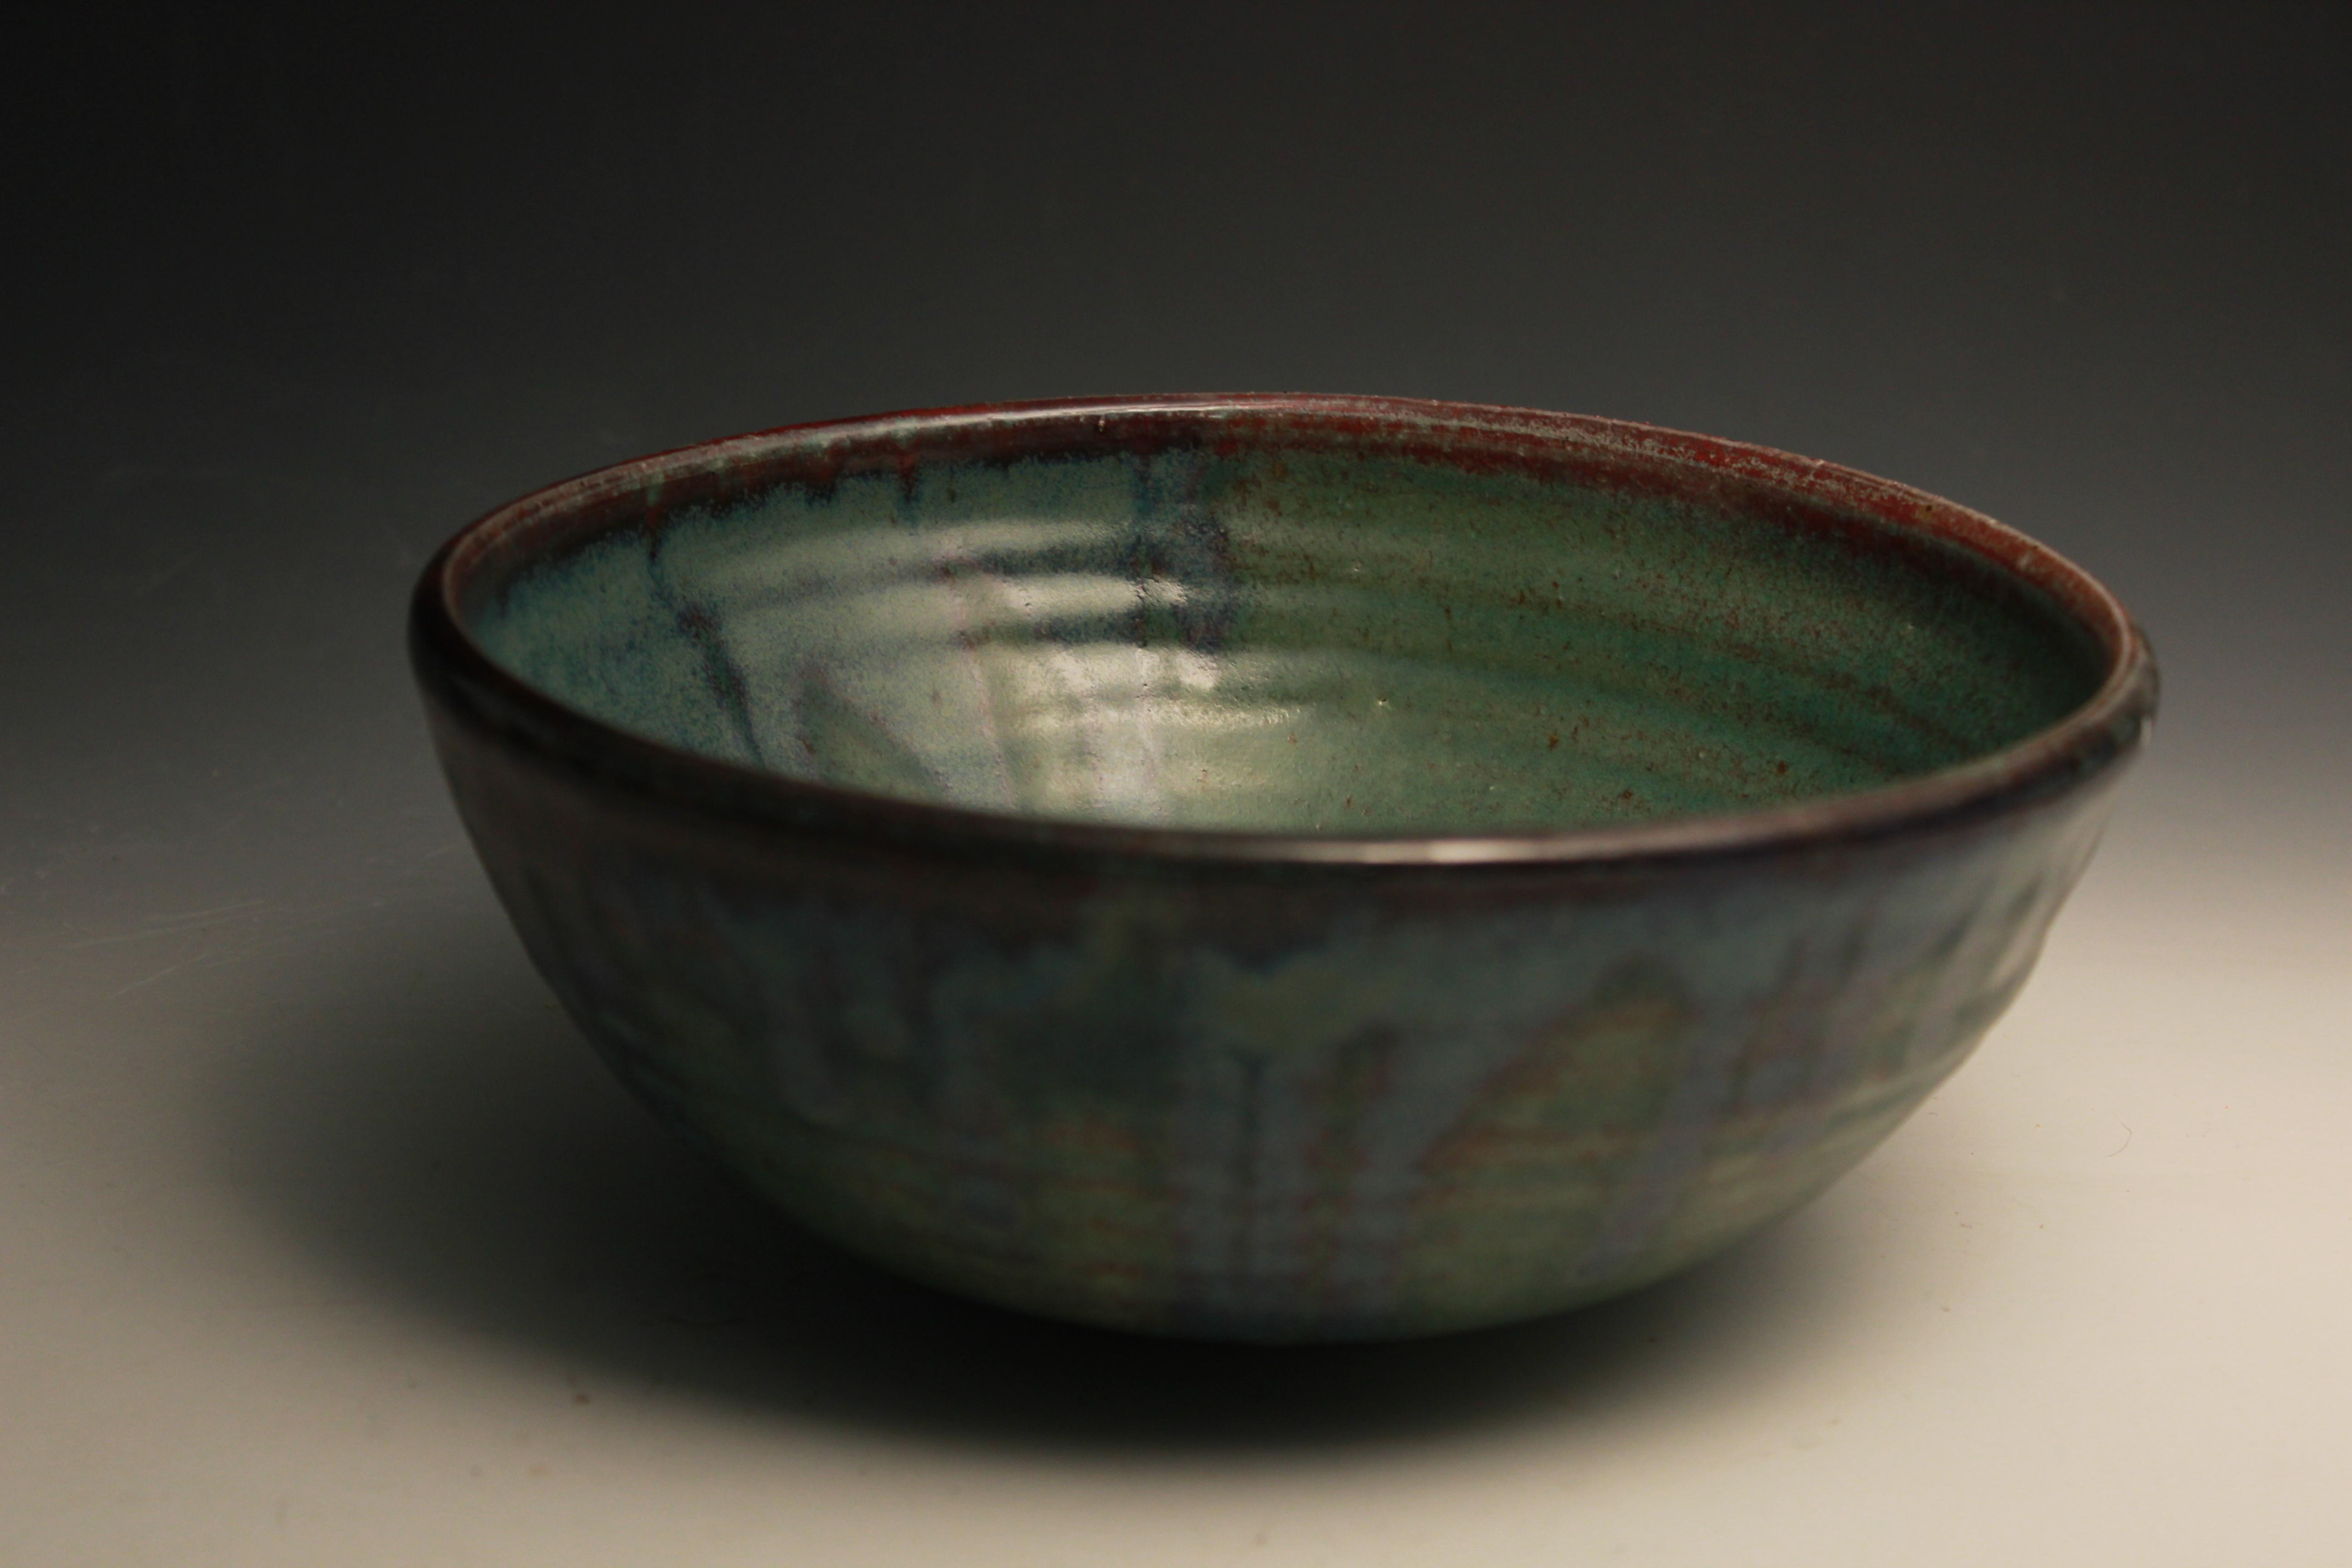 Black stoneware serving bowl